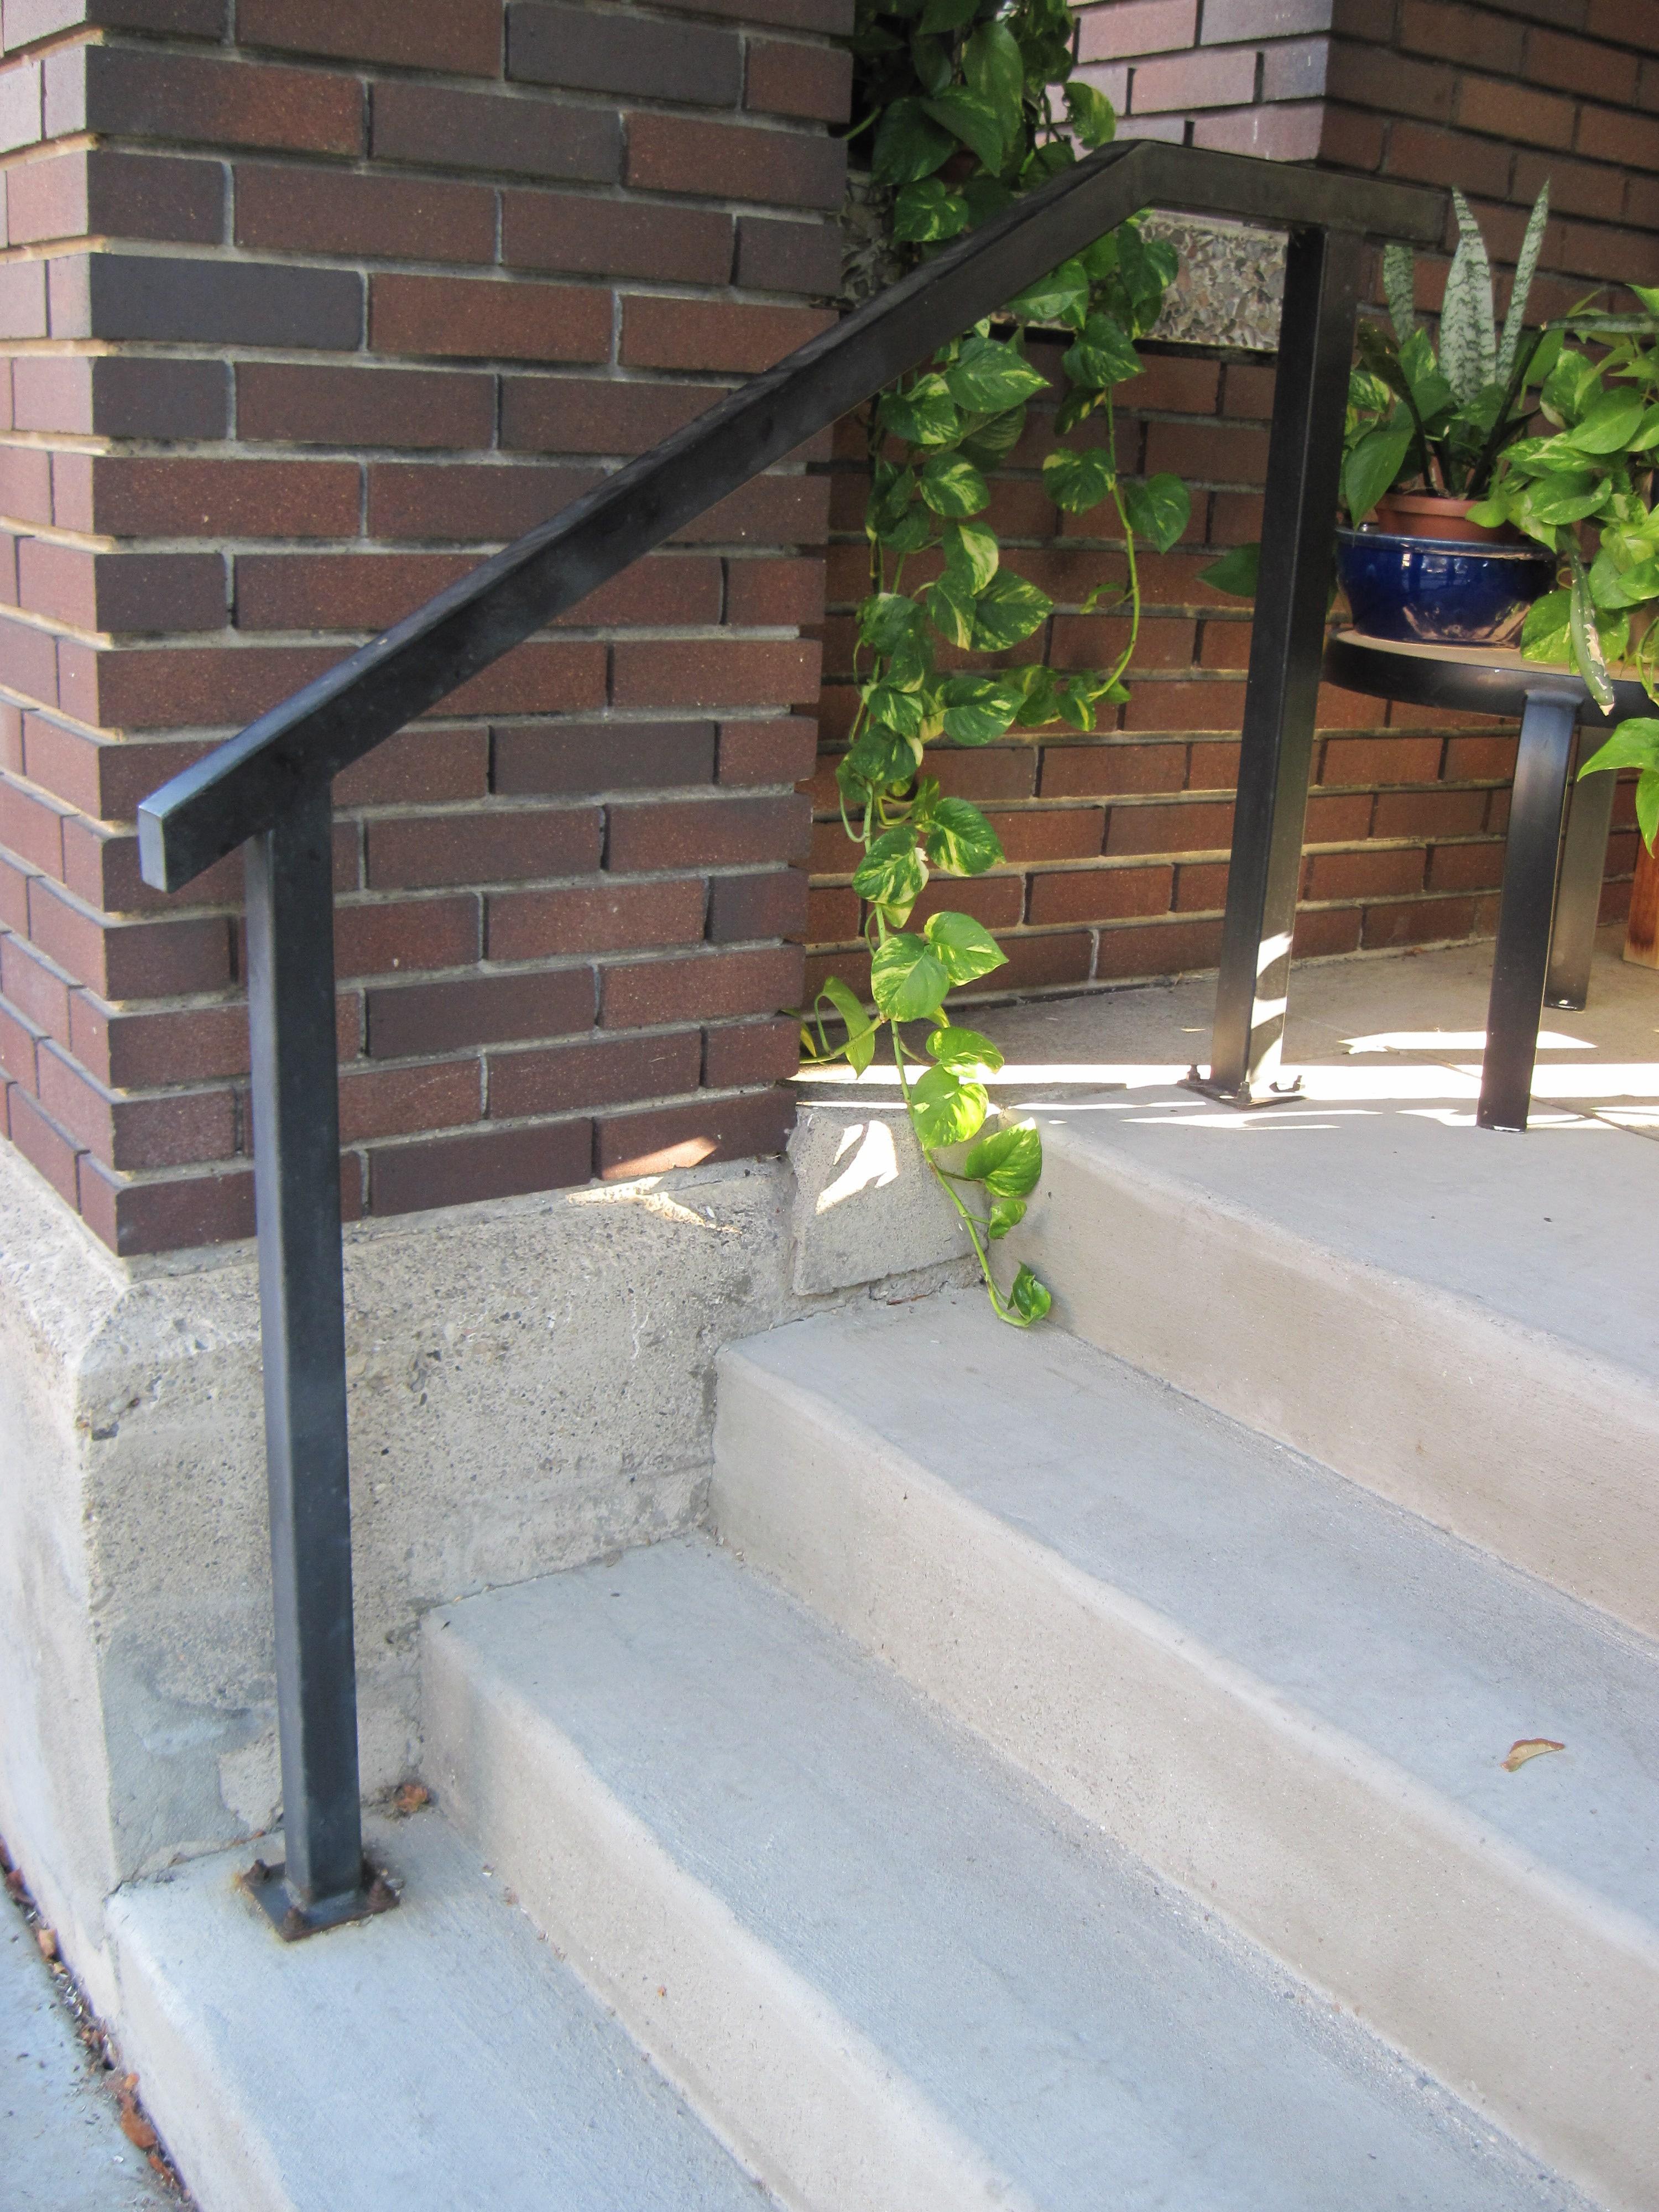 31-3140-Iron-Anvil-Handrails-Post-Mount-Tube-Square-tube-2x2